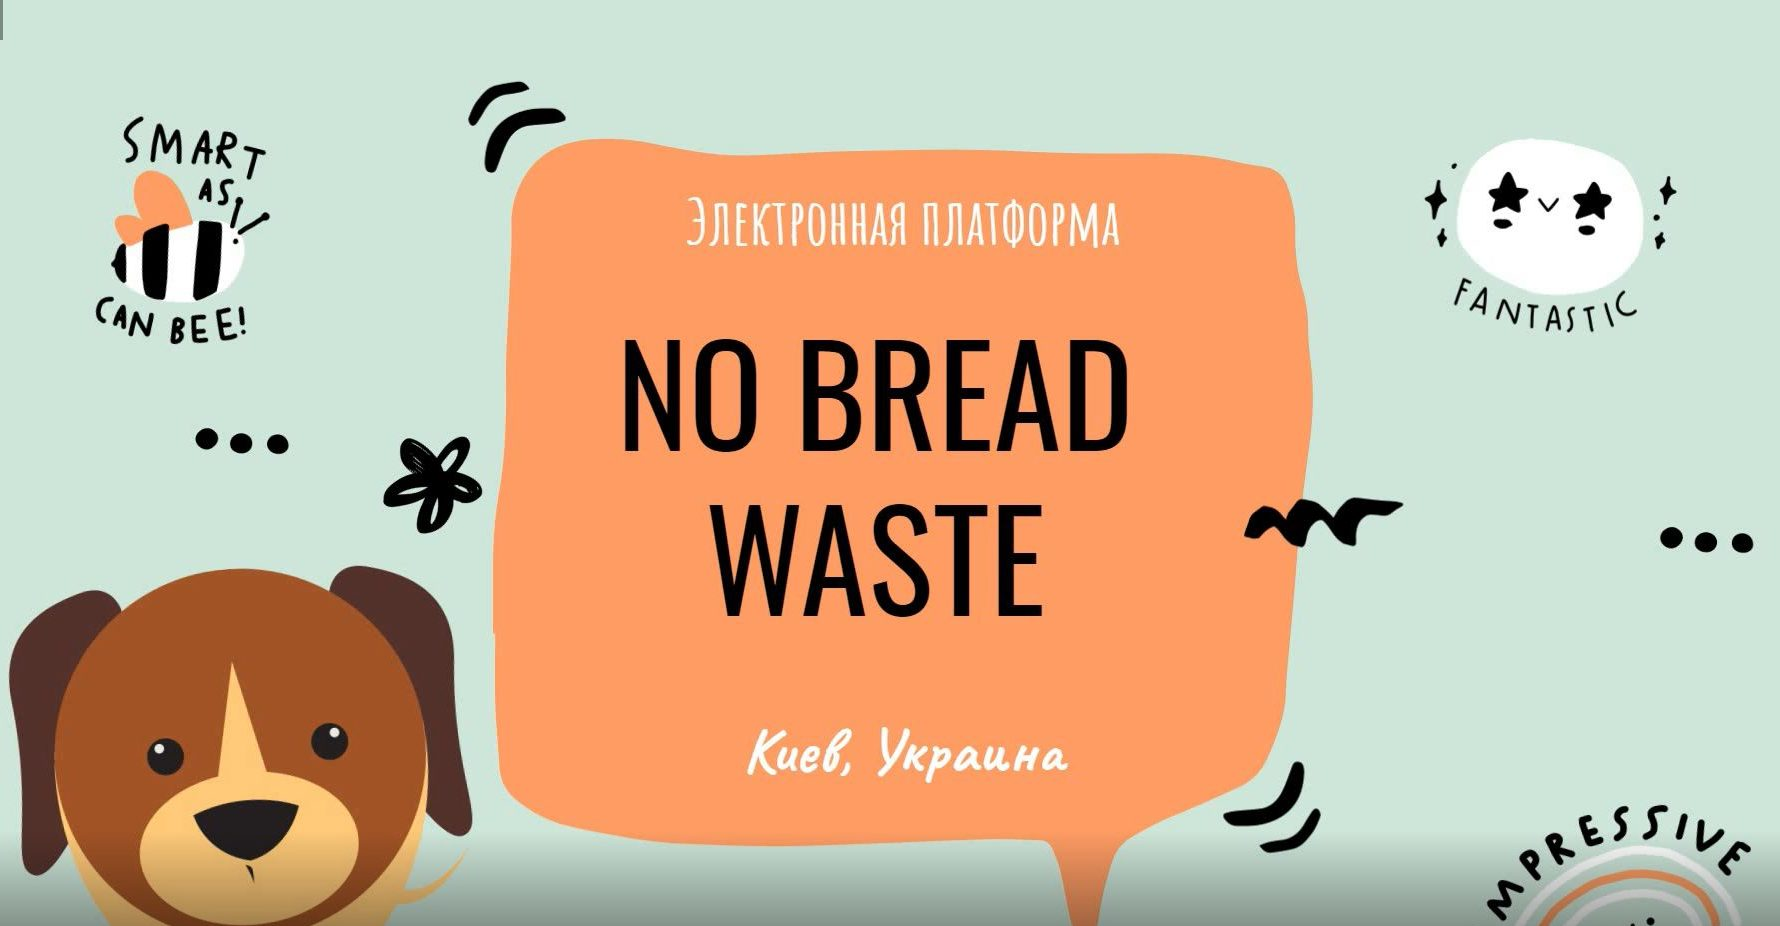 #LocalCorrespondent Opinion / No bread to waste: e-platform idea for fighting food waste